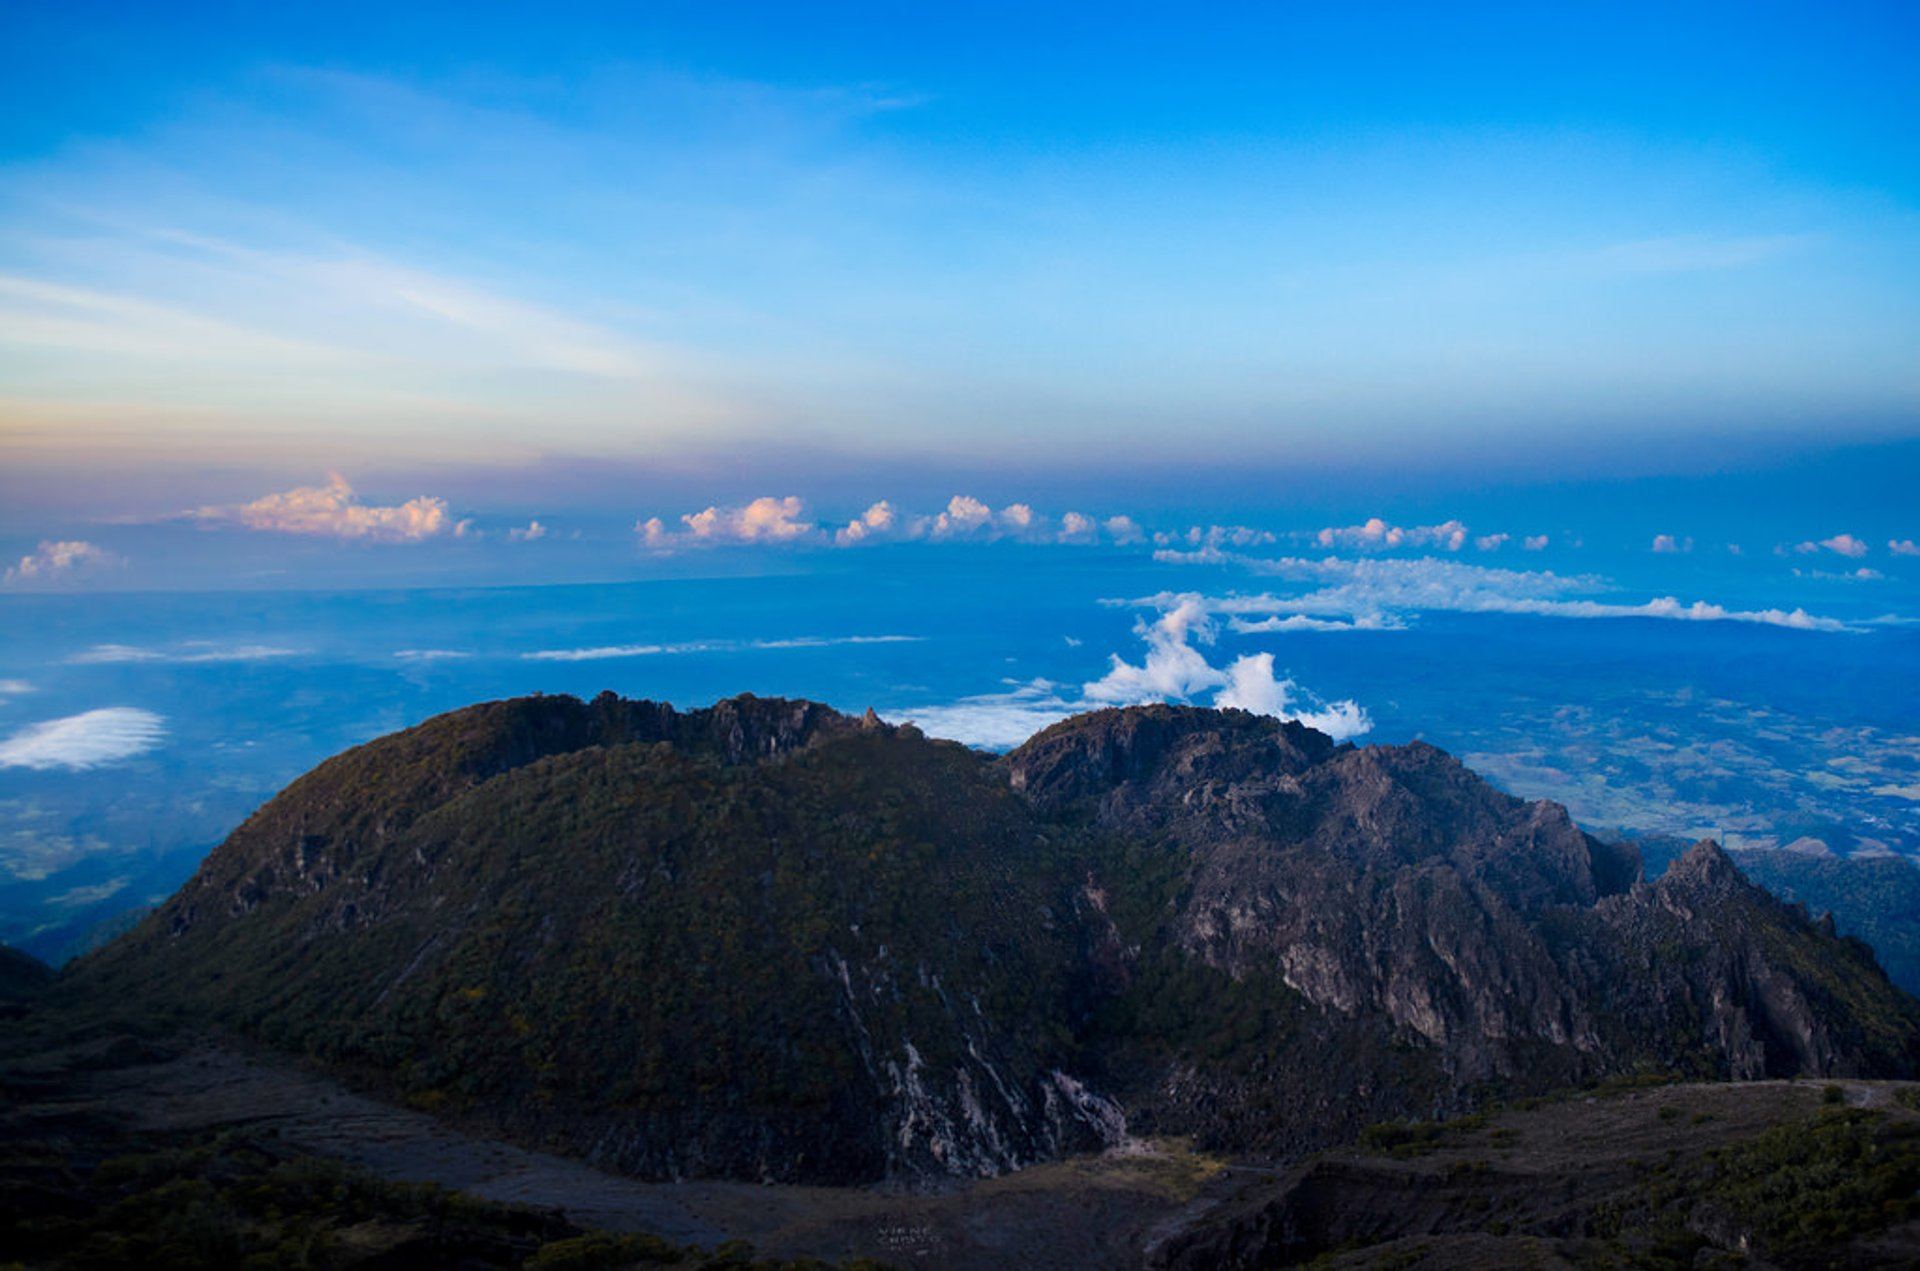 Barú Volcano in Panama 2019 - Best Time